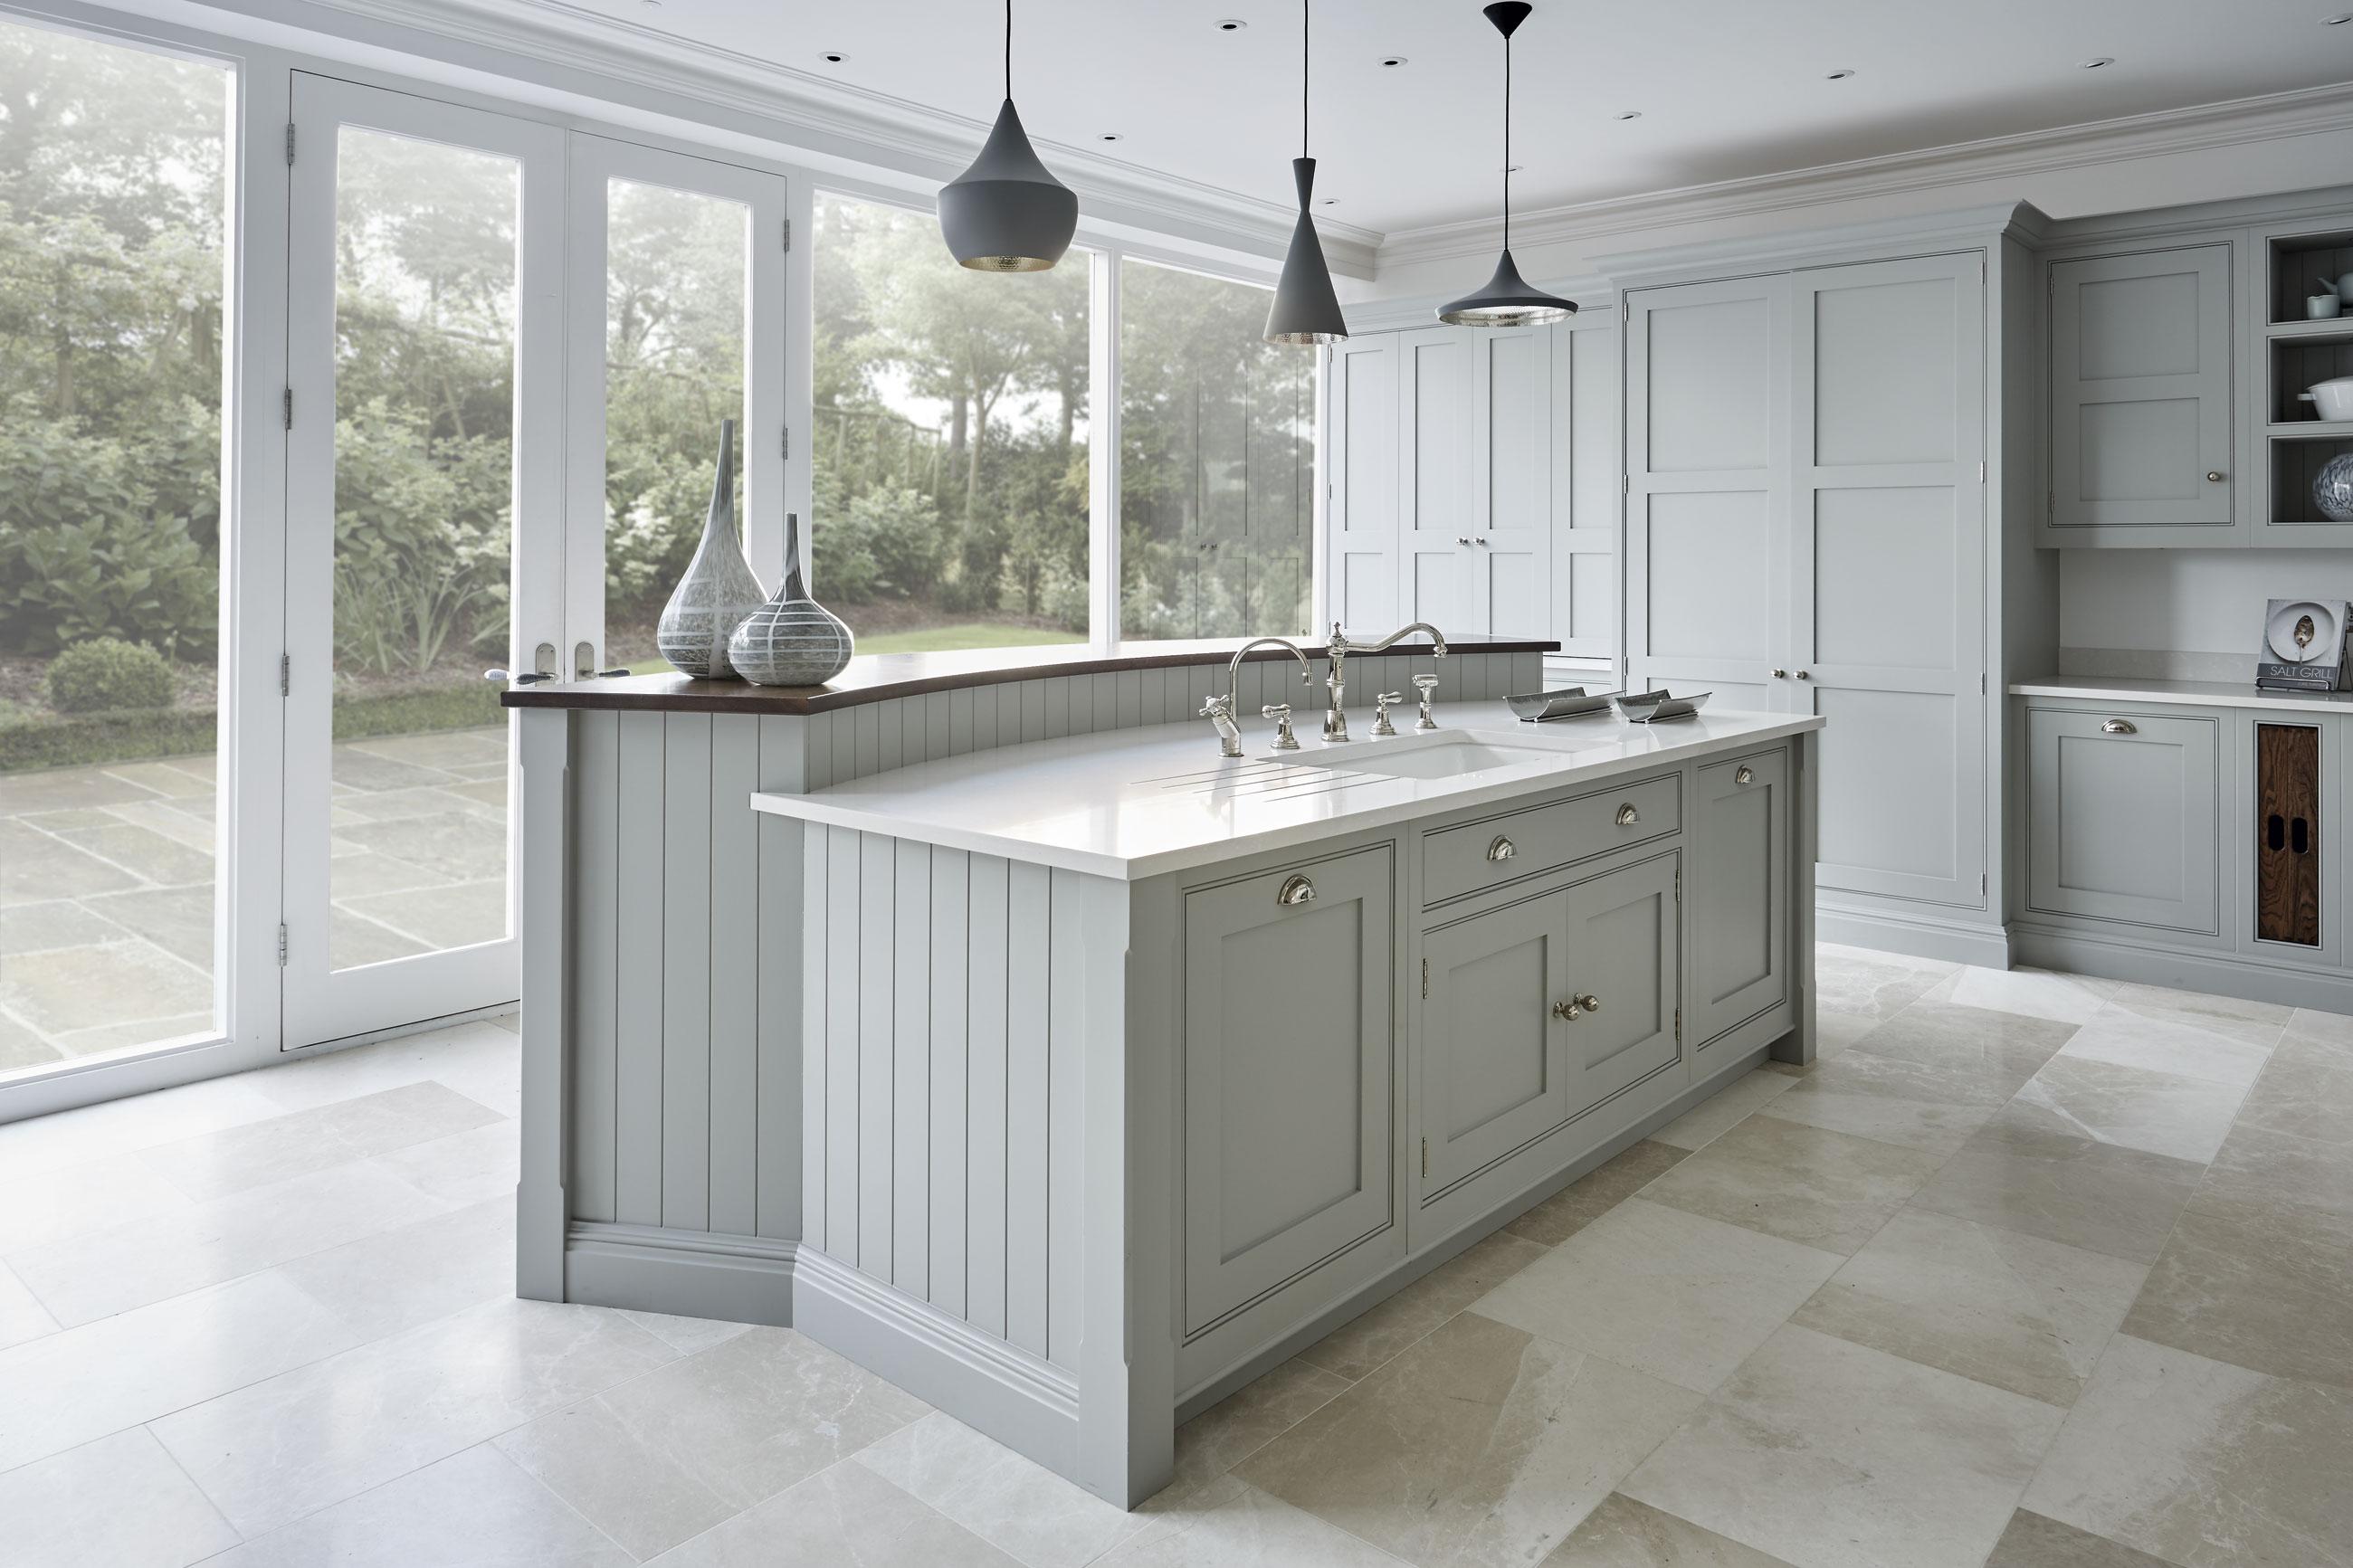 Bespoke Kitchens ... bespoke kitchens designs ideas images designer uk pictures luxury  blackheath kitchen LMVKTBF